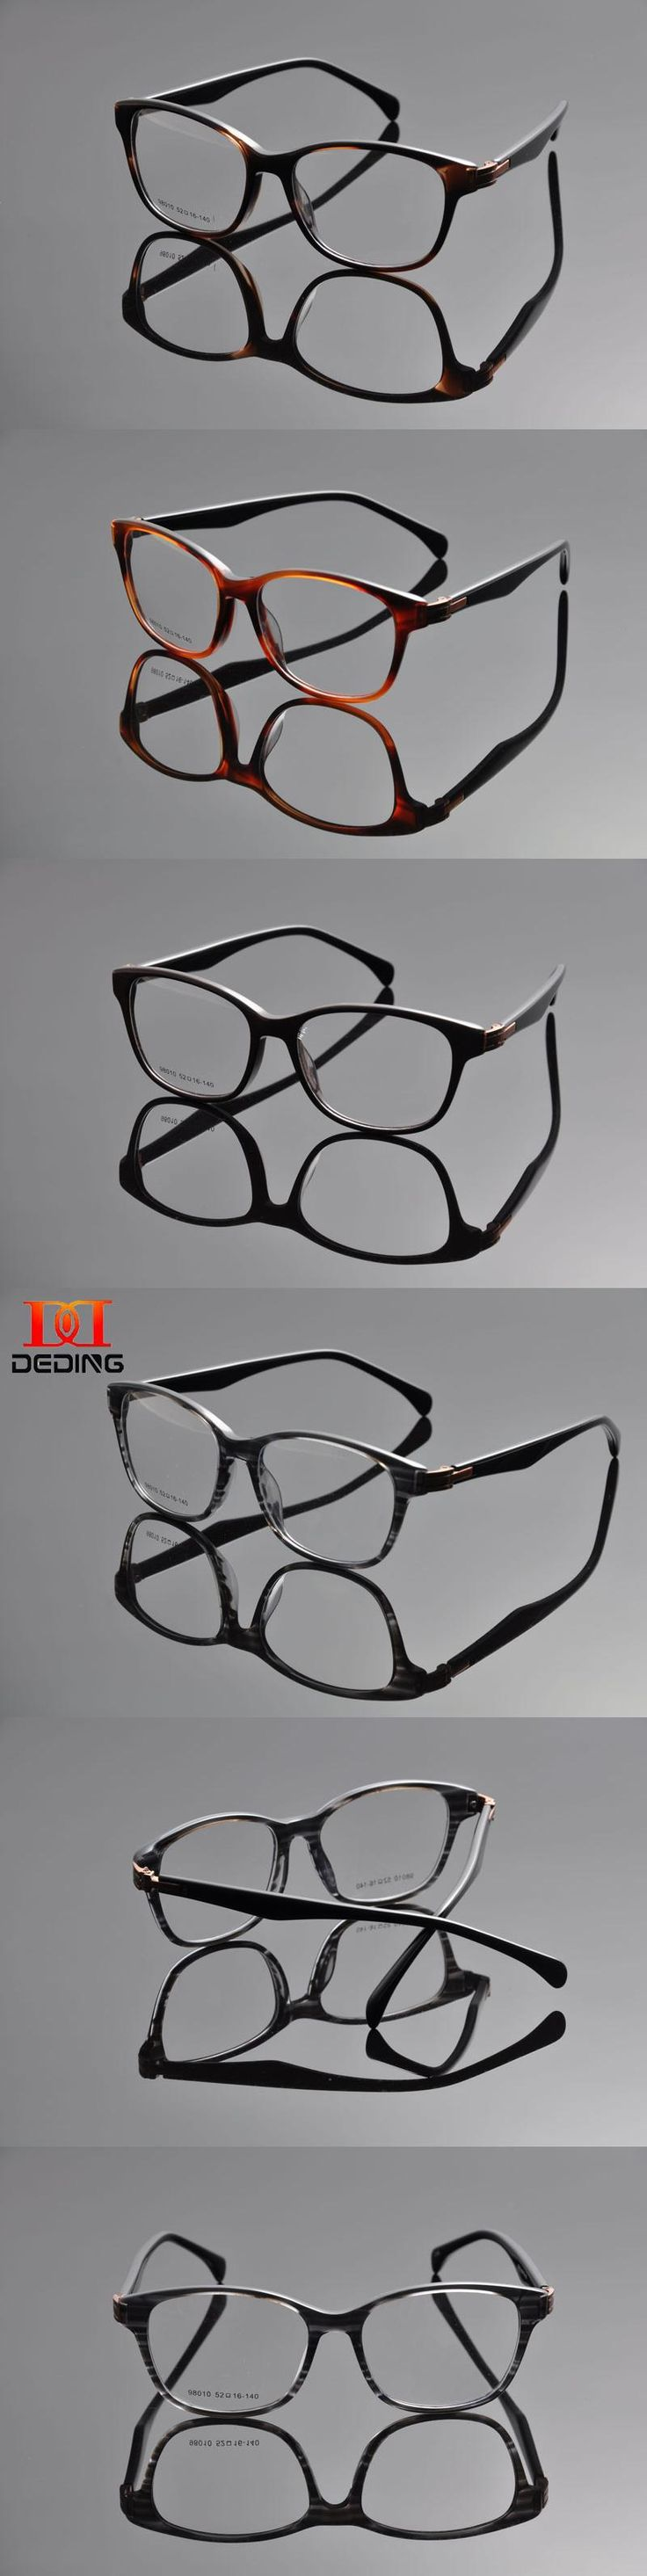 2015 DEDING Retro Unisex Full Frame Acetate Prescription Eyewear Frame Men Women Sports Optical Glasses oculos de grau DD1037